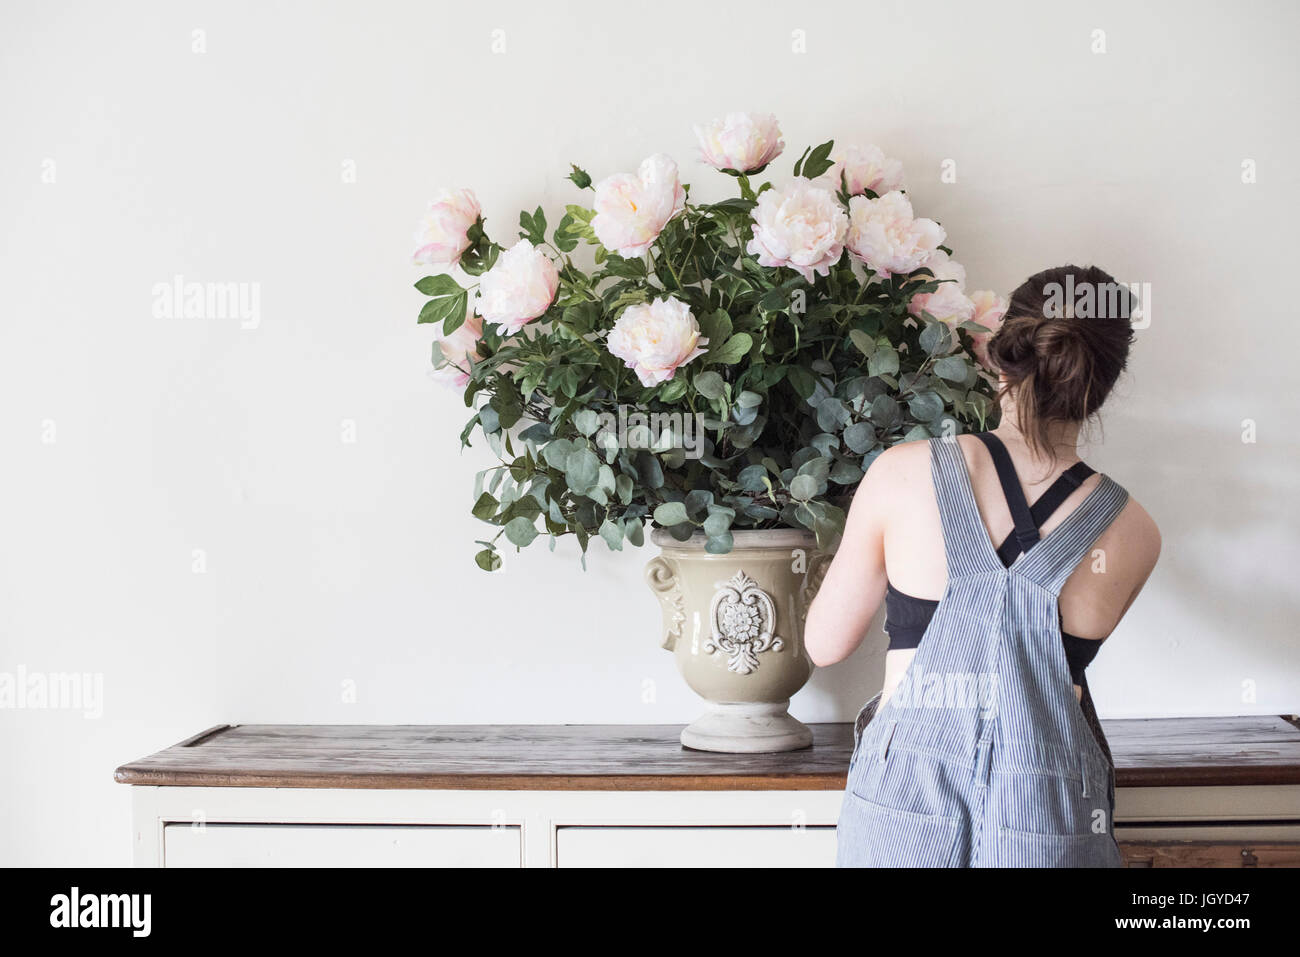 Arranging flowers - Stock Image